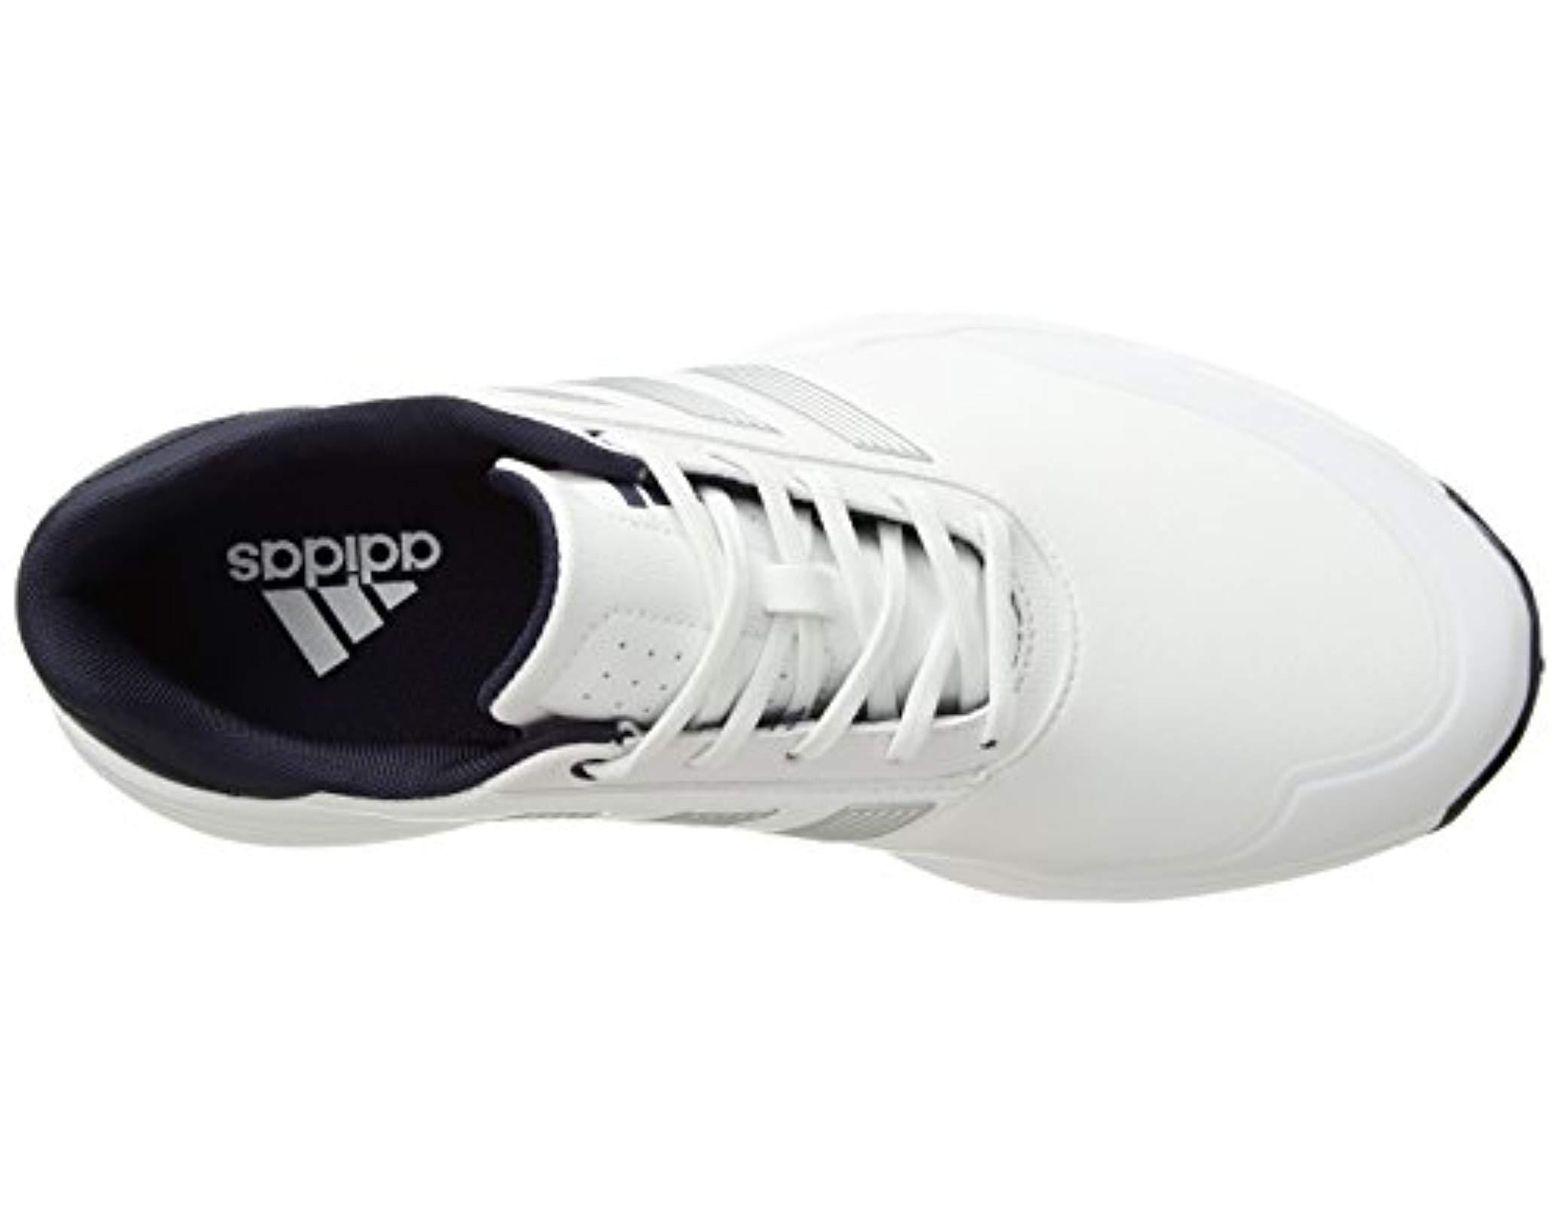 Wd Ftwwht Bounce G Men's Adidas Adipower zqGjVLSUMp